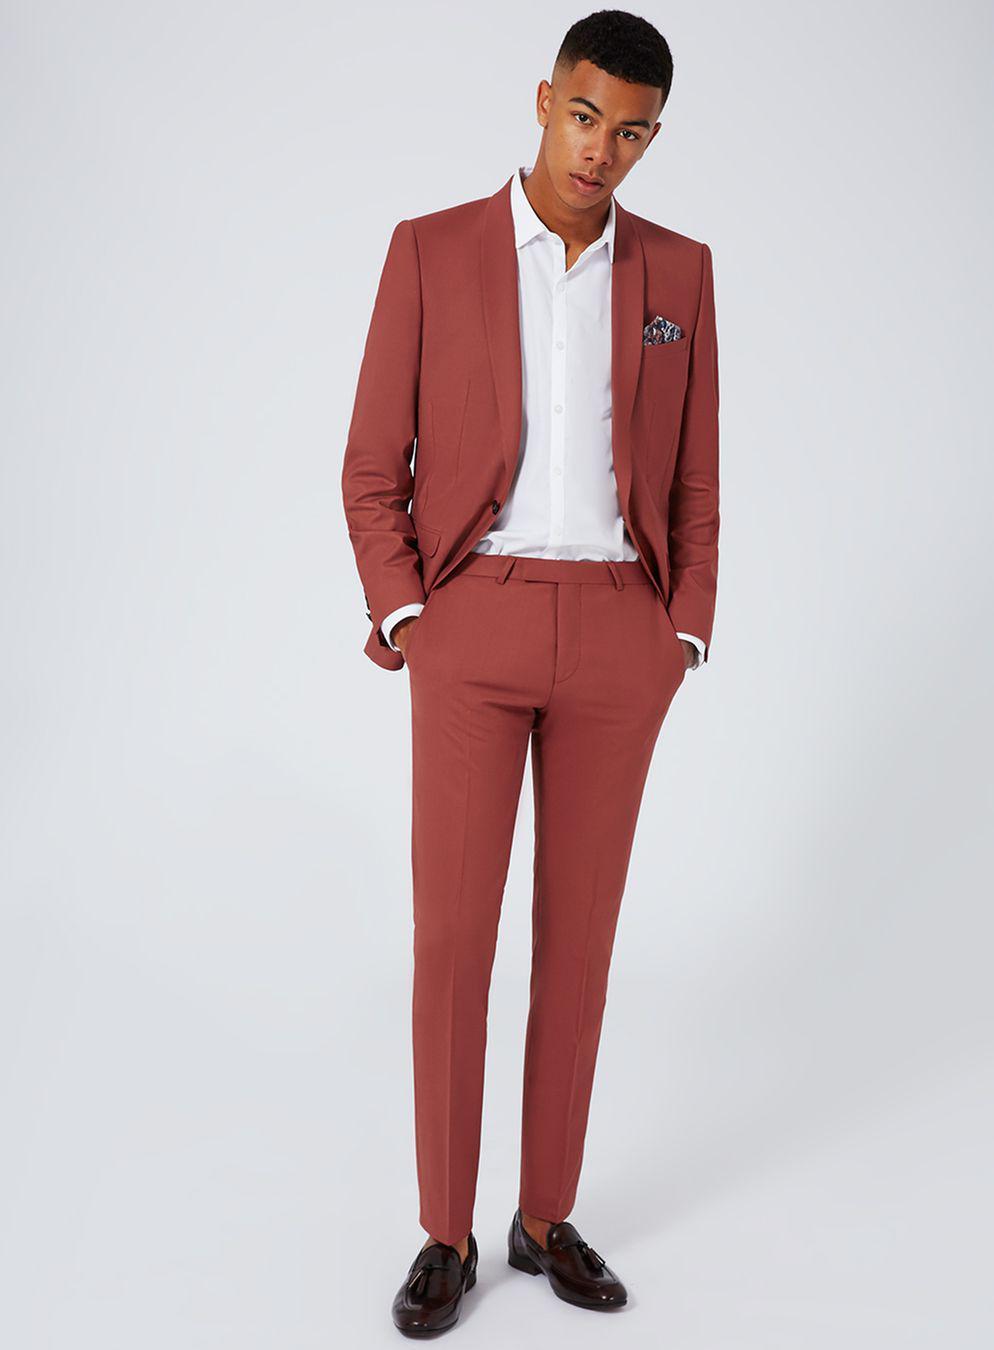 TOPMAN Synthetic Noose & Monkey Rust Slim Fit Suit Trouser in Brown for Men